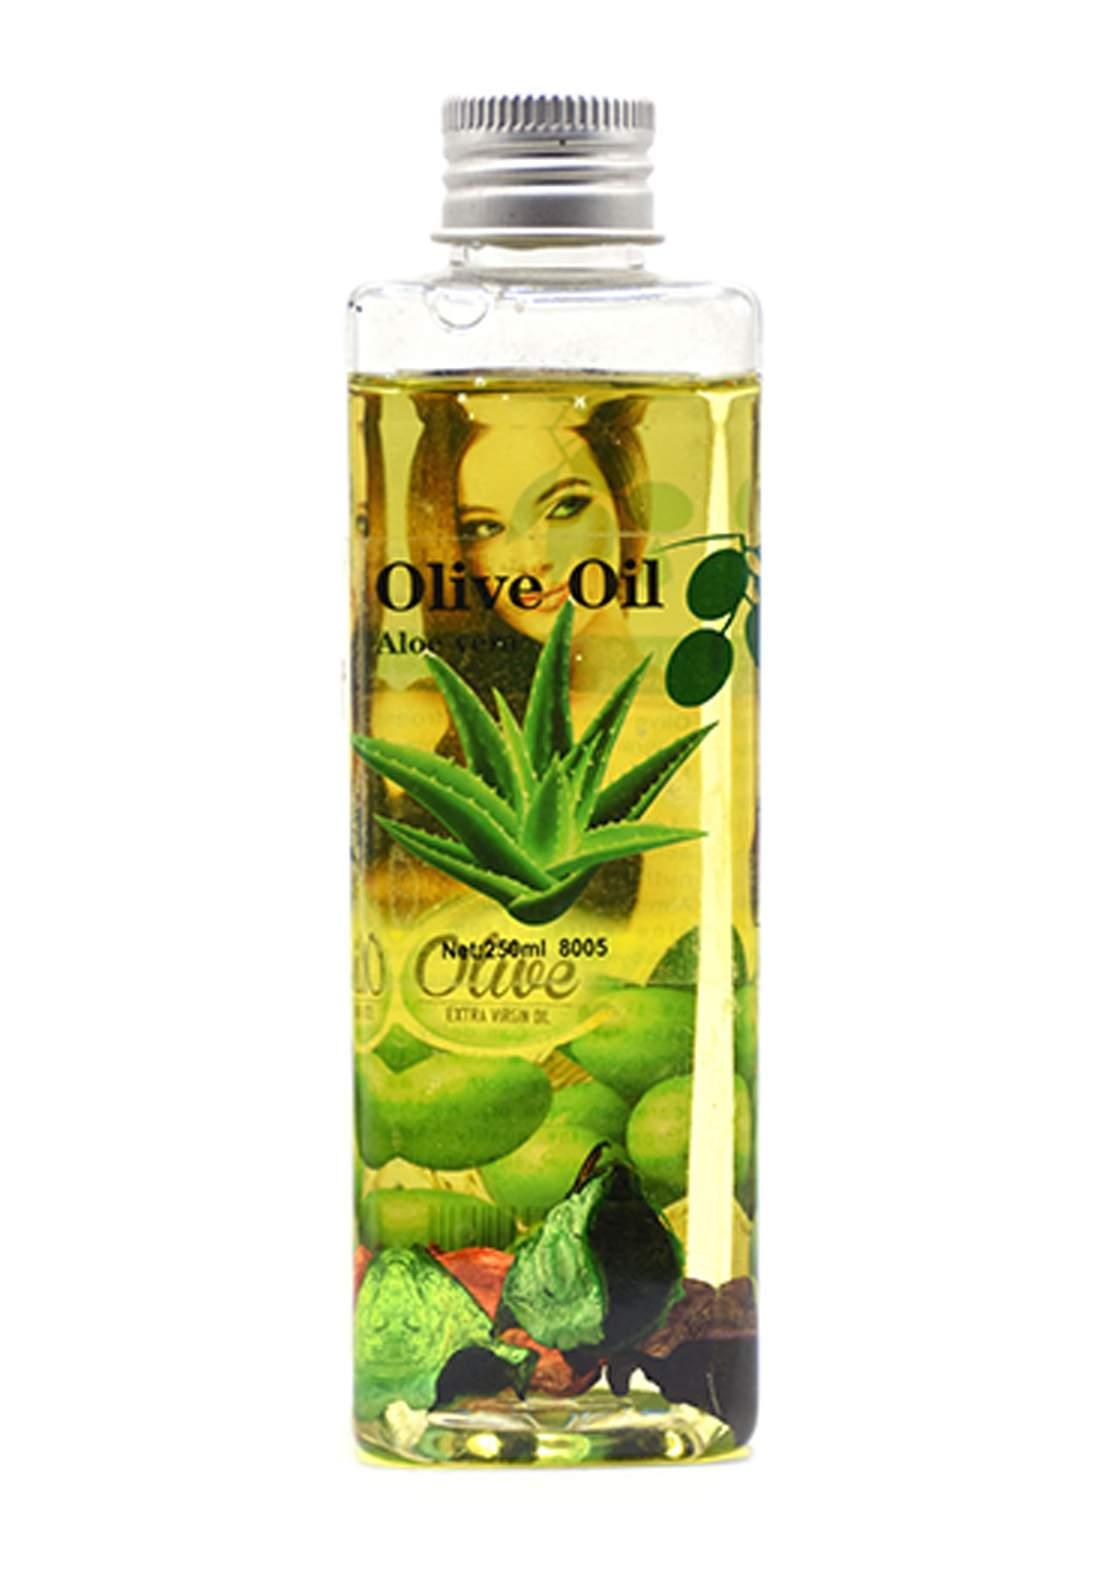 Olive Oil and Aloe Vera for Hair 250 ml زيت الزيتون والصبار للشعر